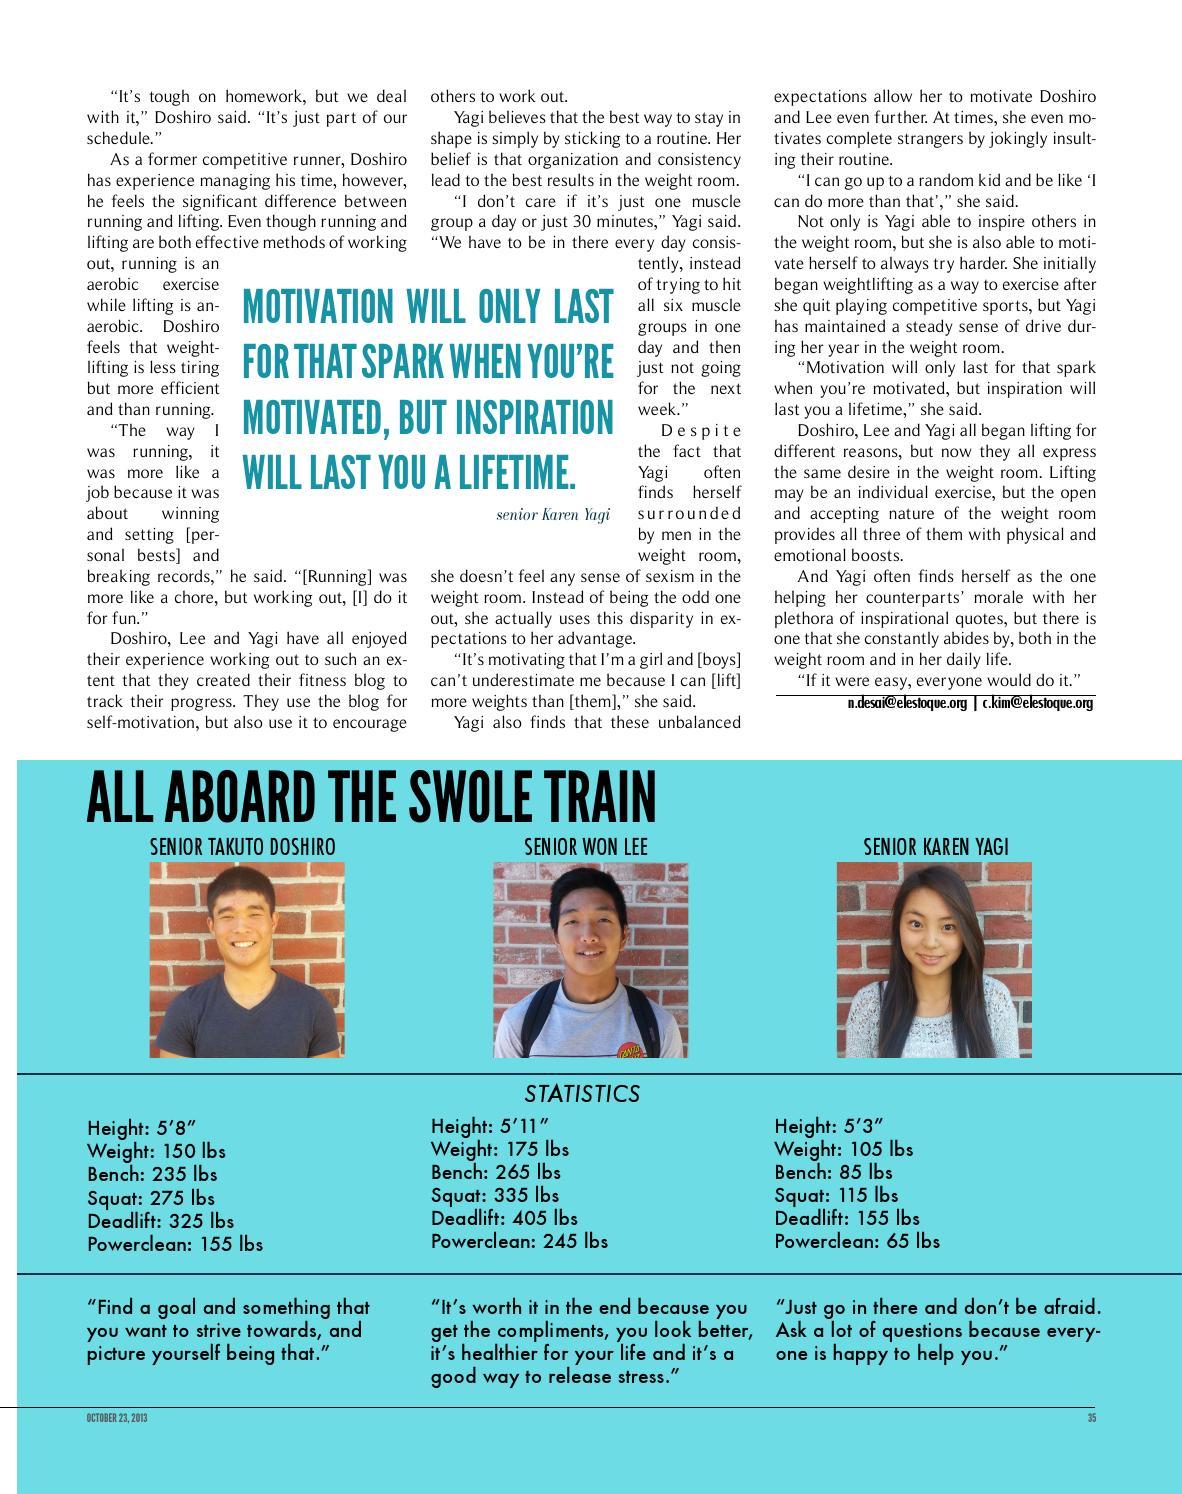 Volume 44, Issue 2, October 23, 2013